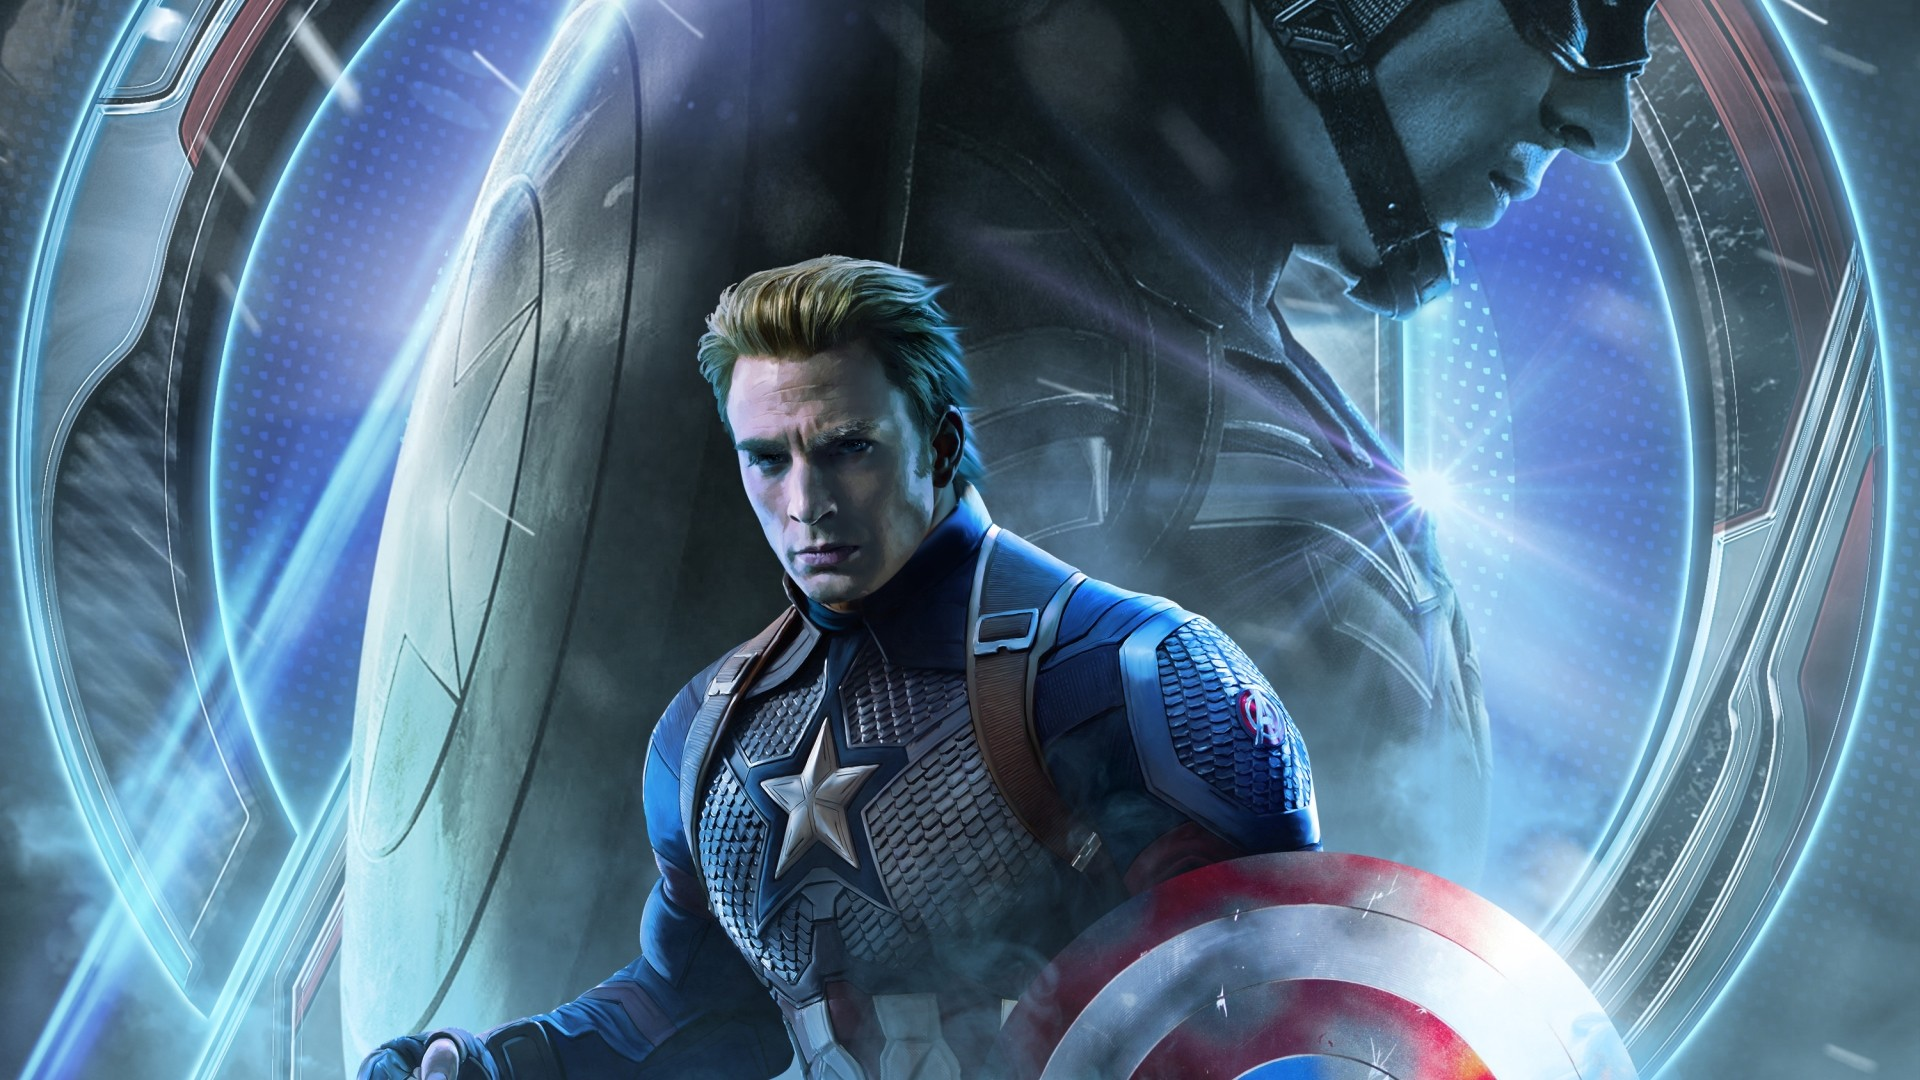 Captain America hd wallpaper for pc